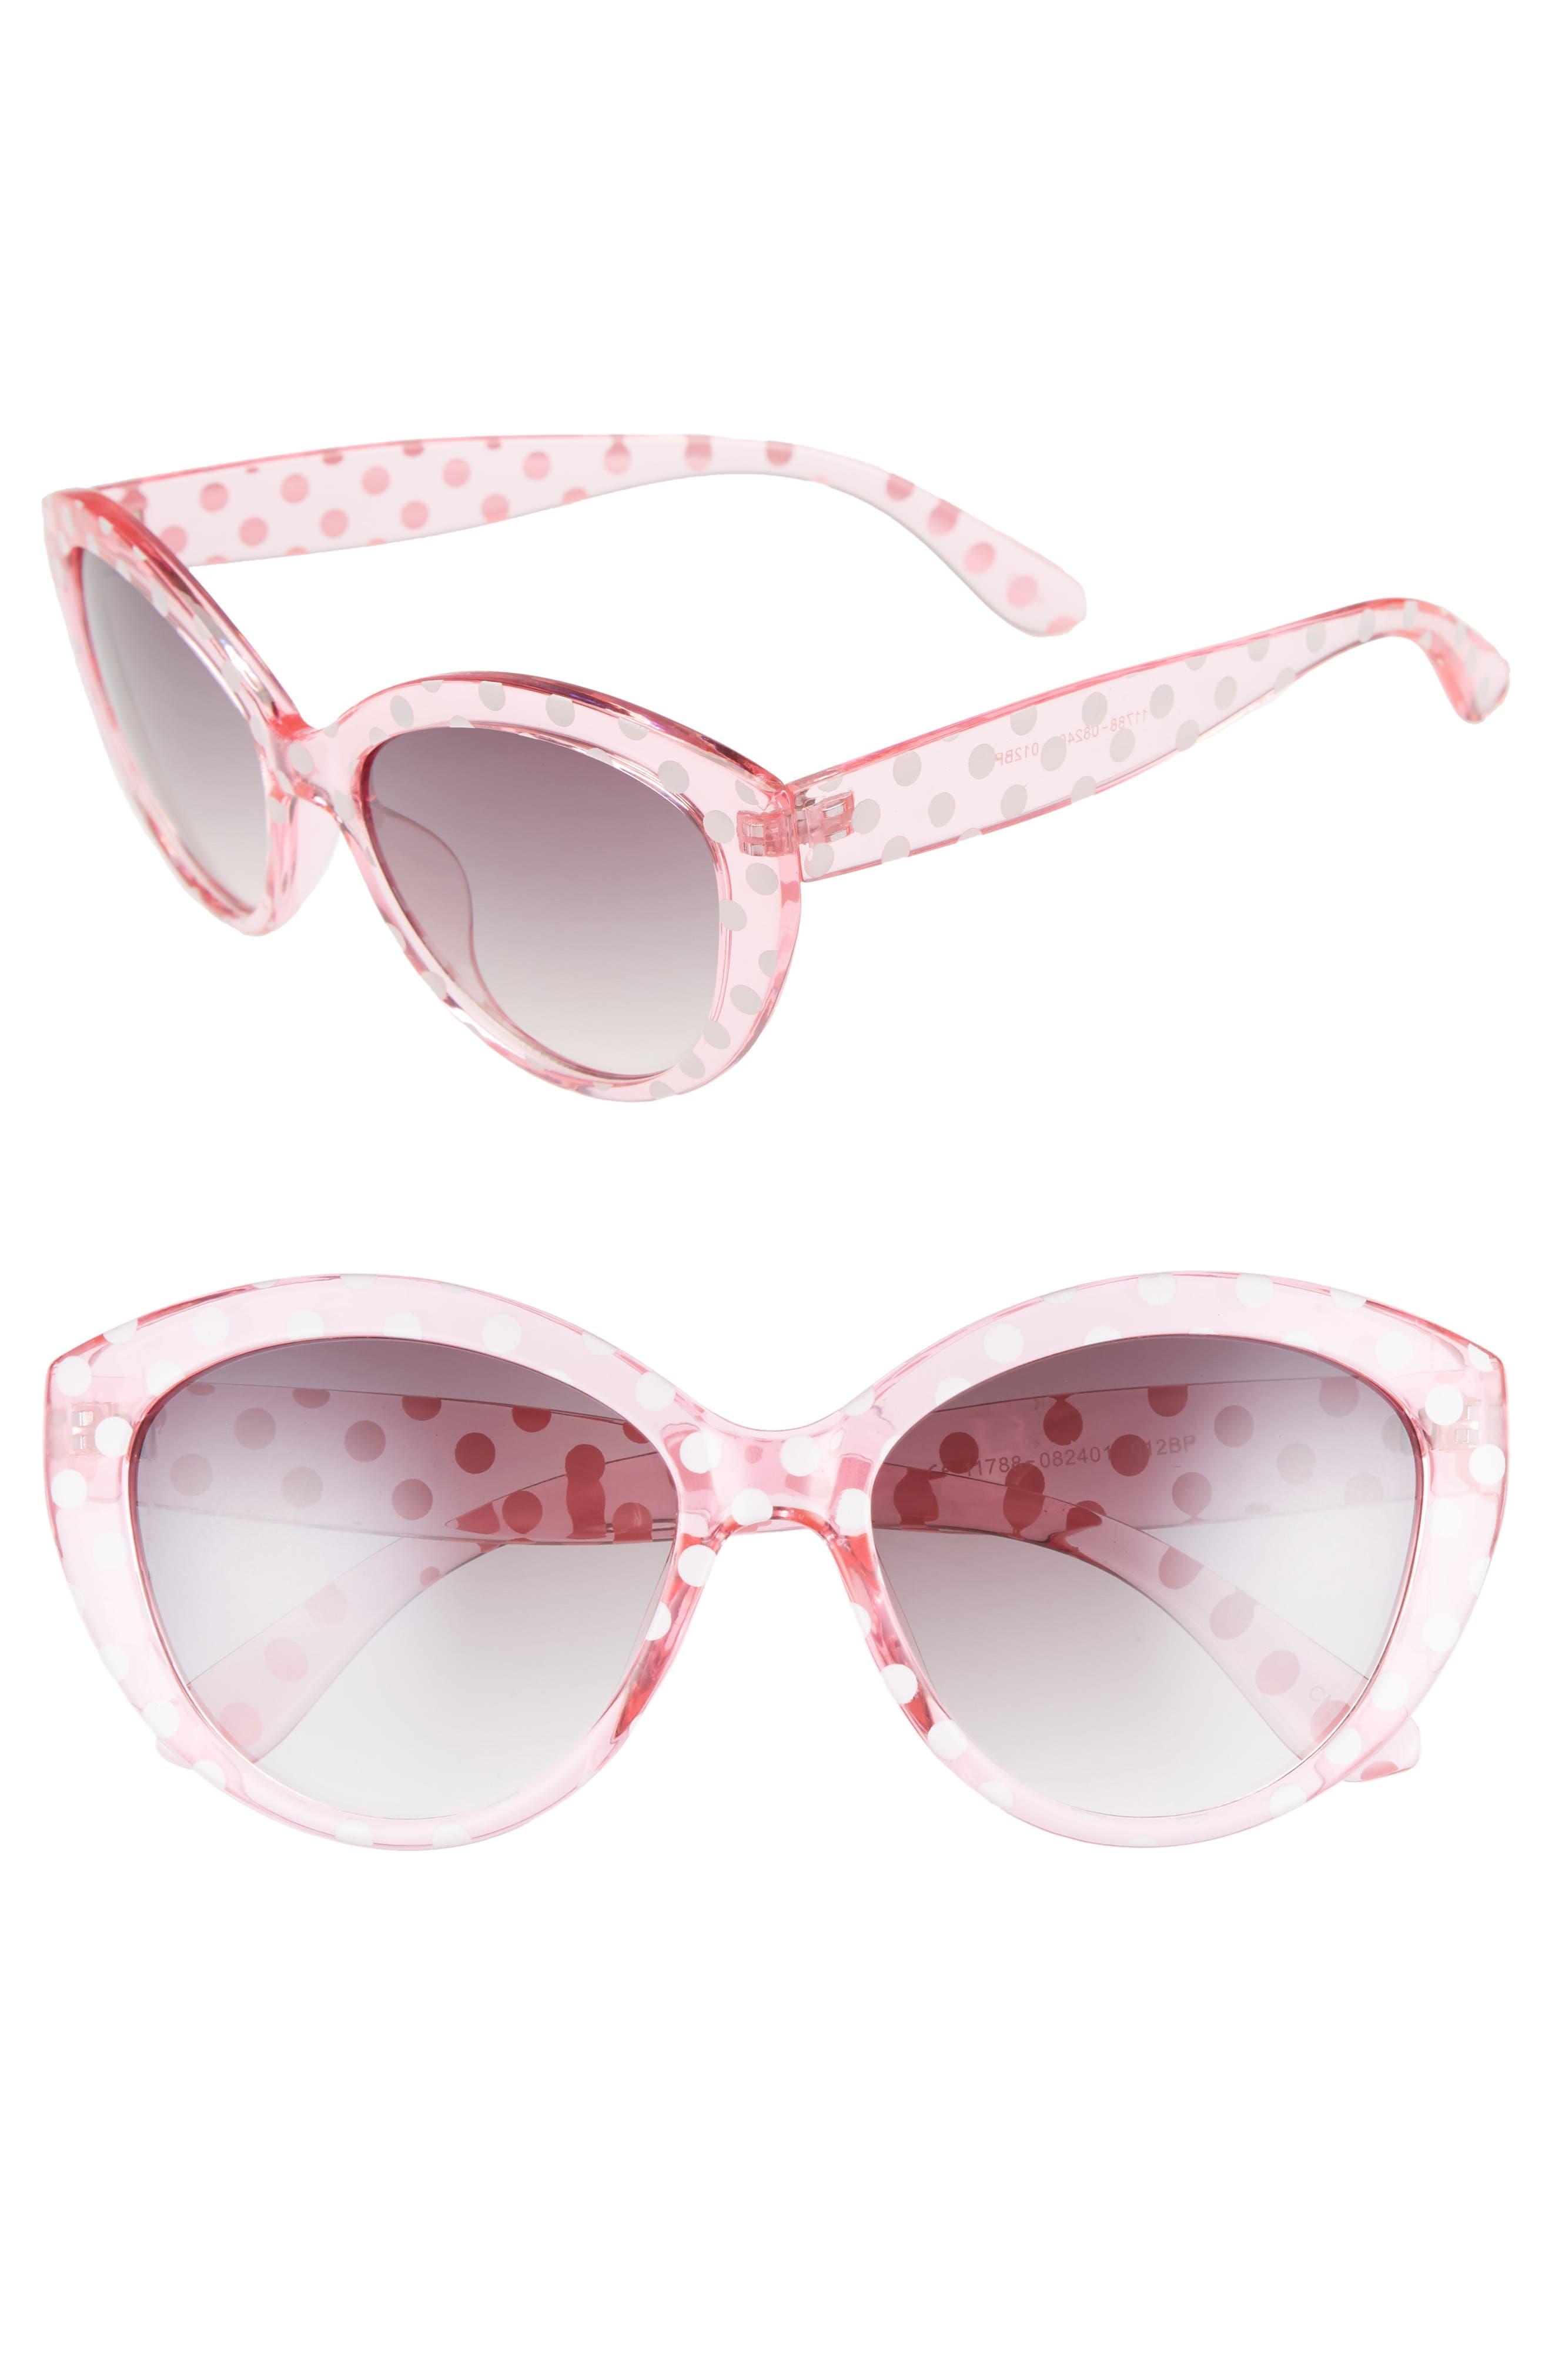 55mm Translucent Polka Dot Cat Eye Sunglasses,                         Main,                         color, PINK/ BLACK